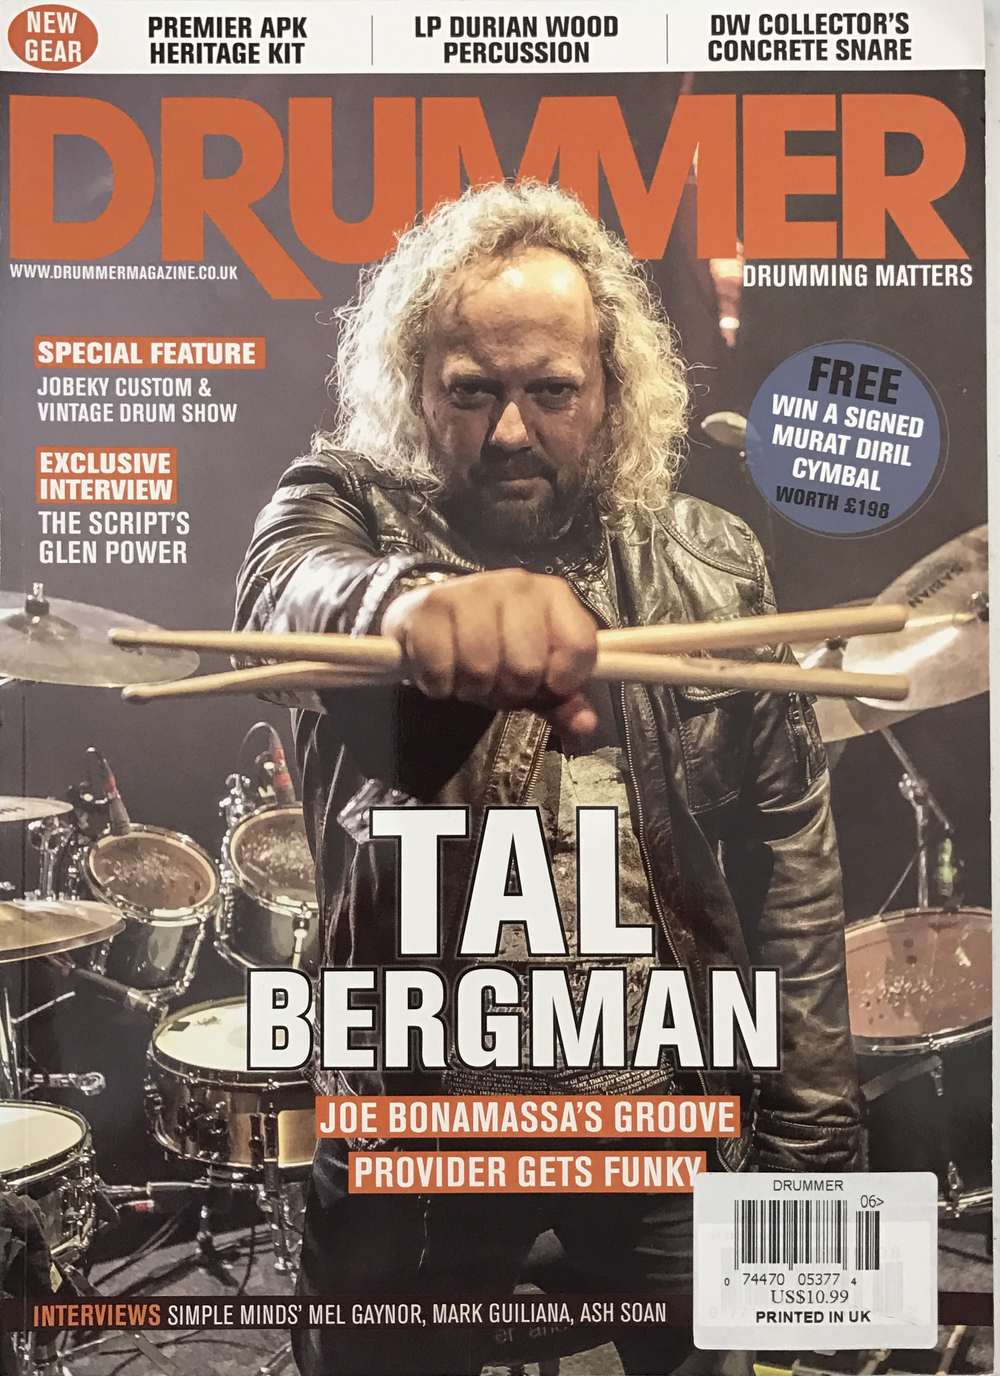 DRUMMER MAGAZINE JUNE 2013 TAL BERGMAN COVER